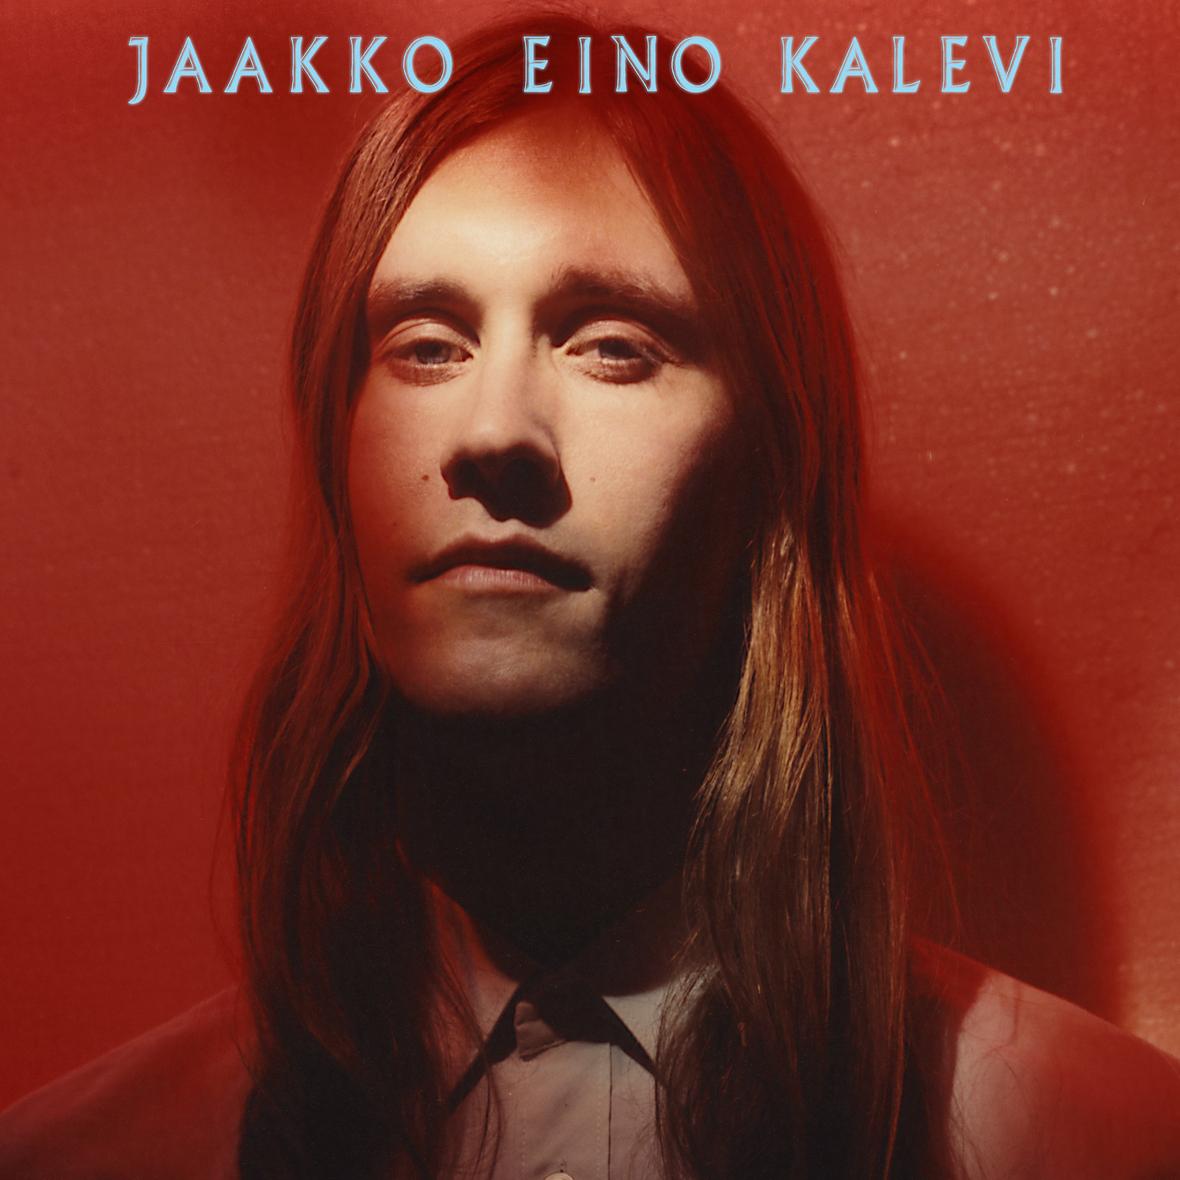 Jaakko_Eino_Kalevi_Album_Cover_Art